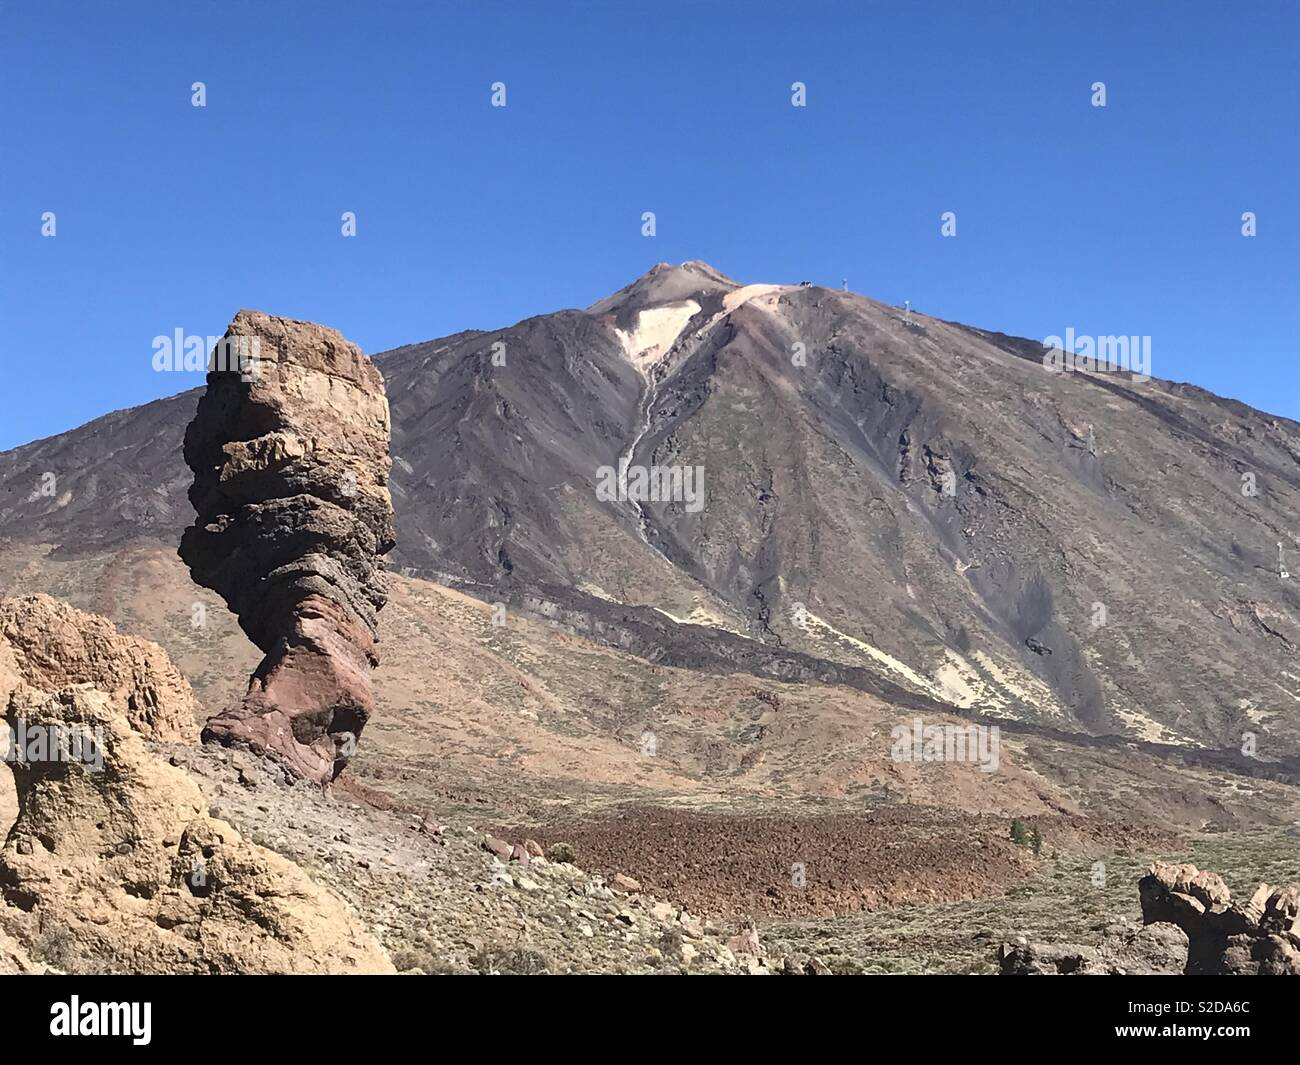 Teide Tenerife Spain - Stock Image